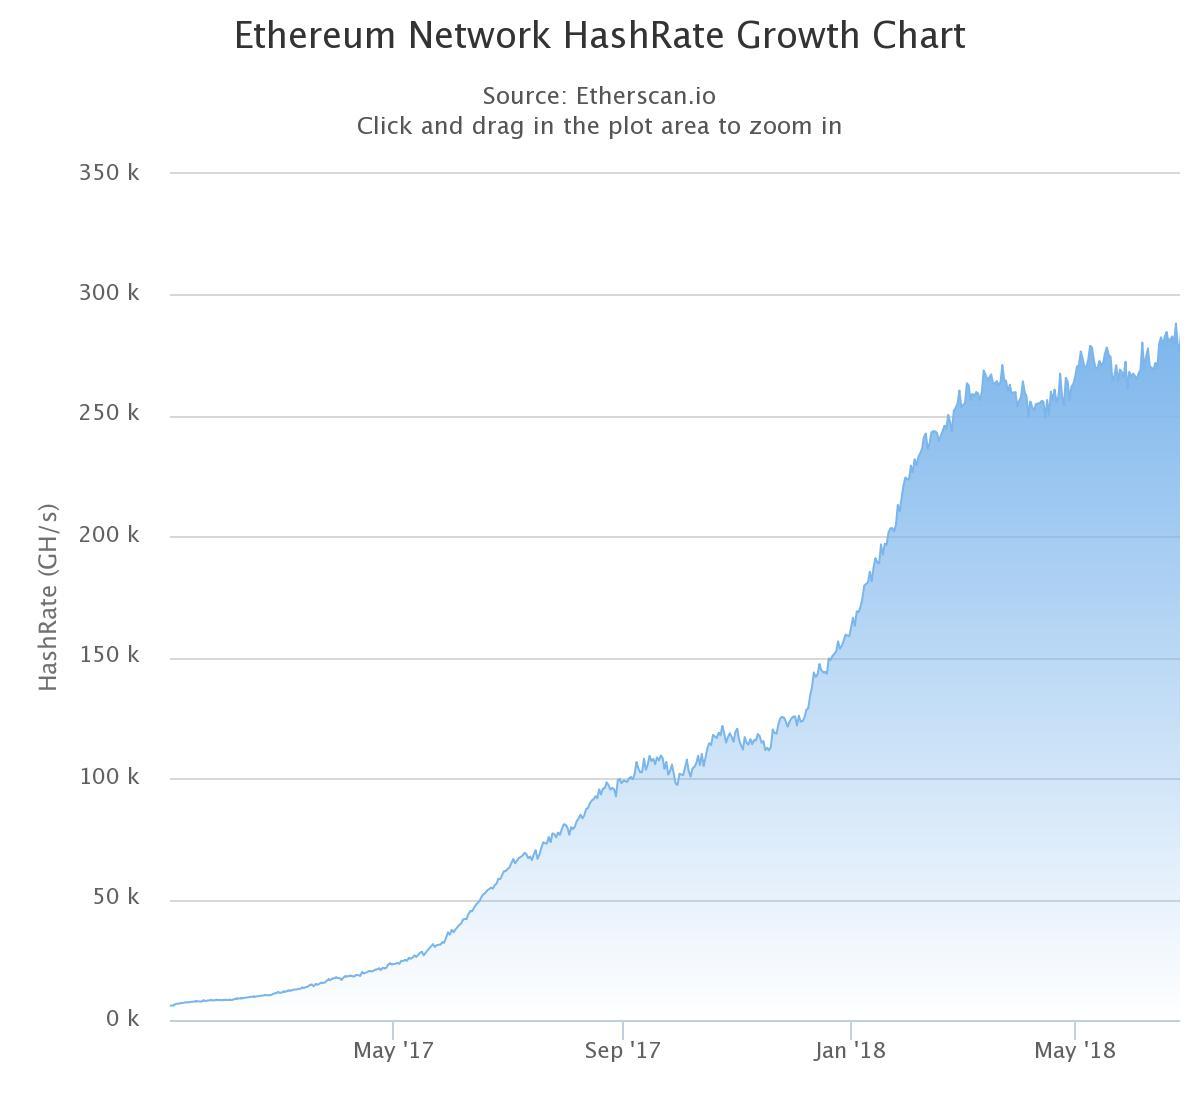 eth chart - Digi Times: Наблюдается падение спроса на оборудование для майнинга